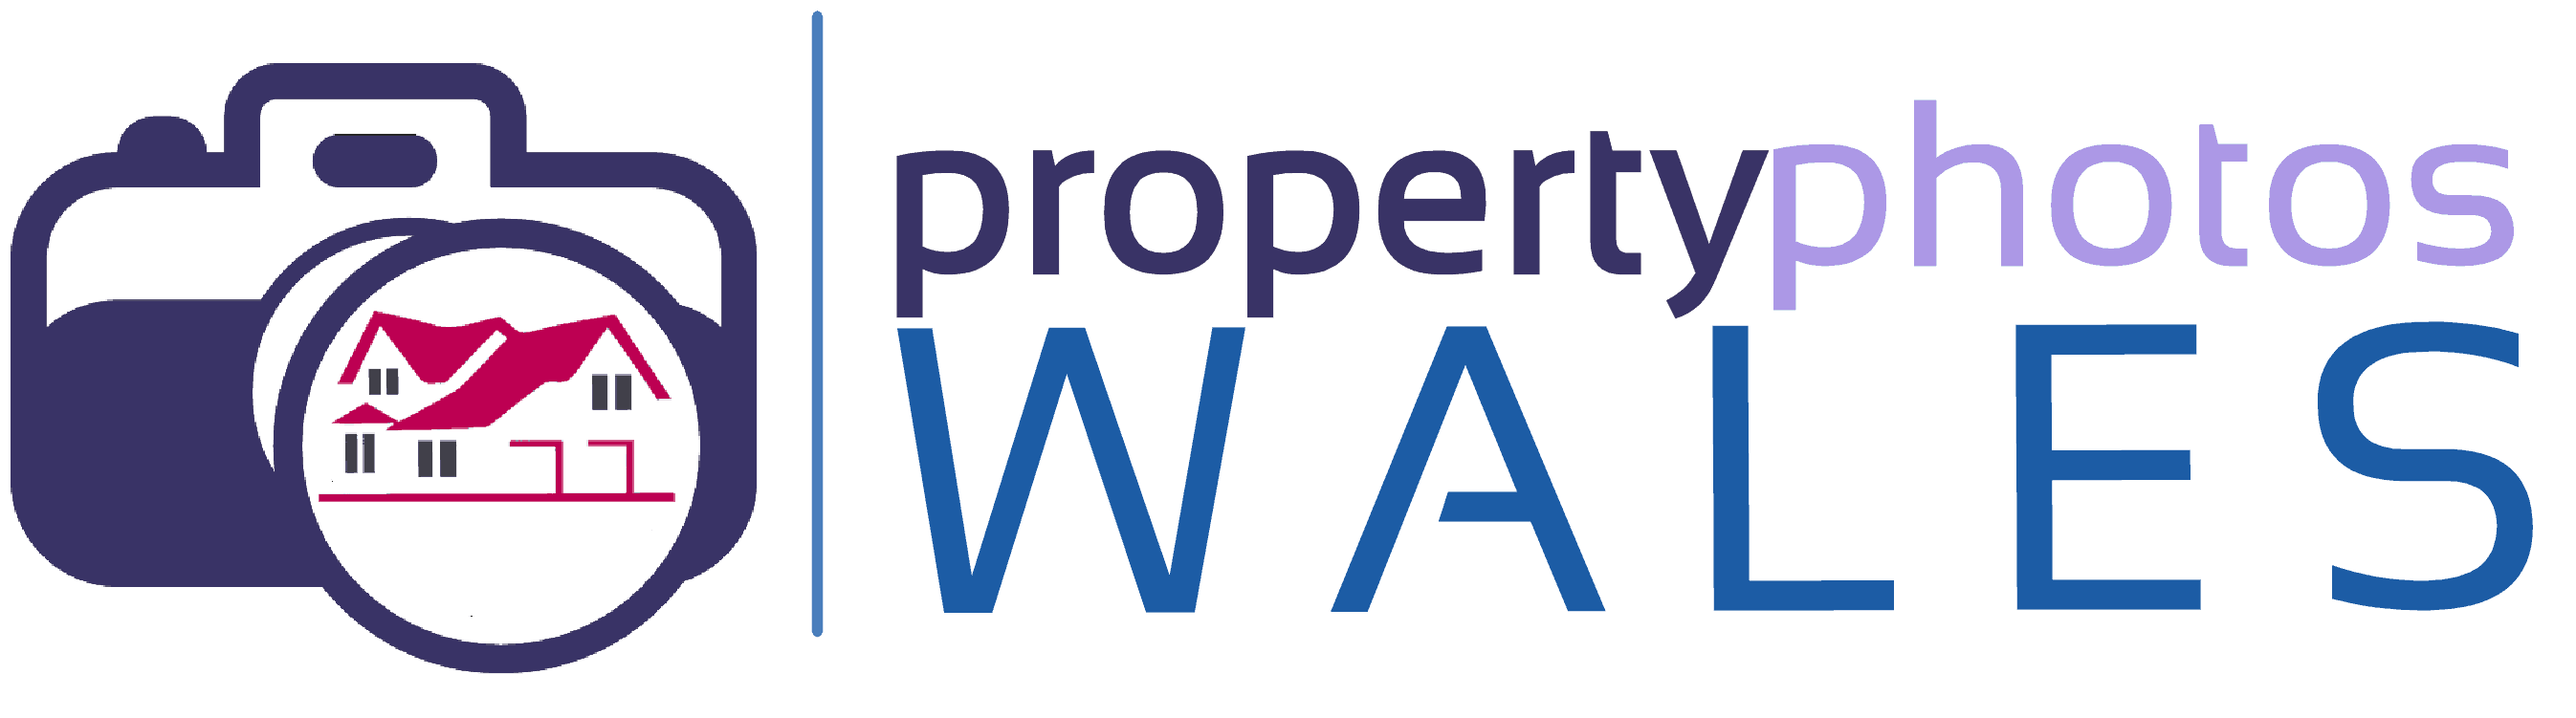 Property Photos Wales